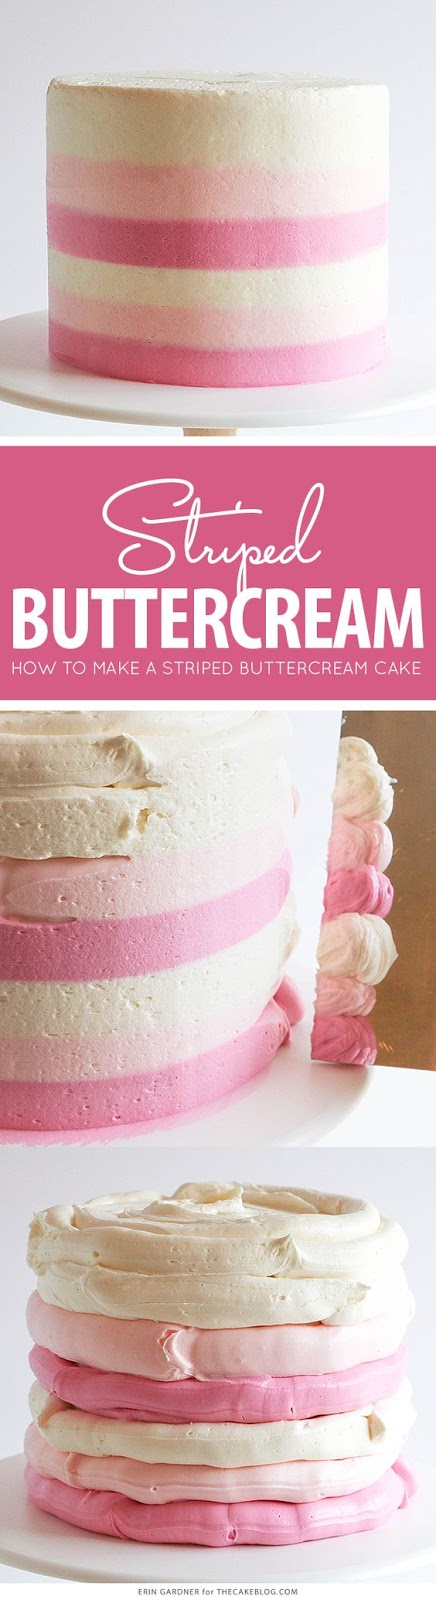 STRIPED BUTTERCREAM CAKE